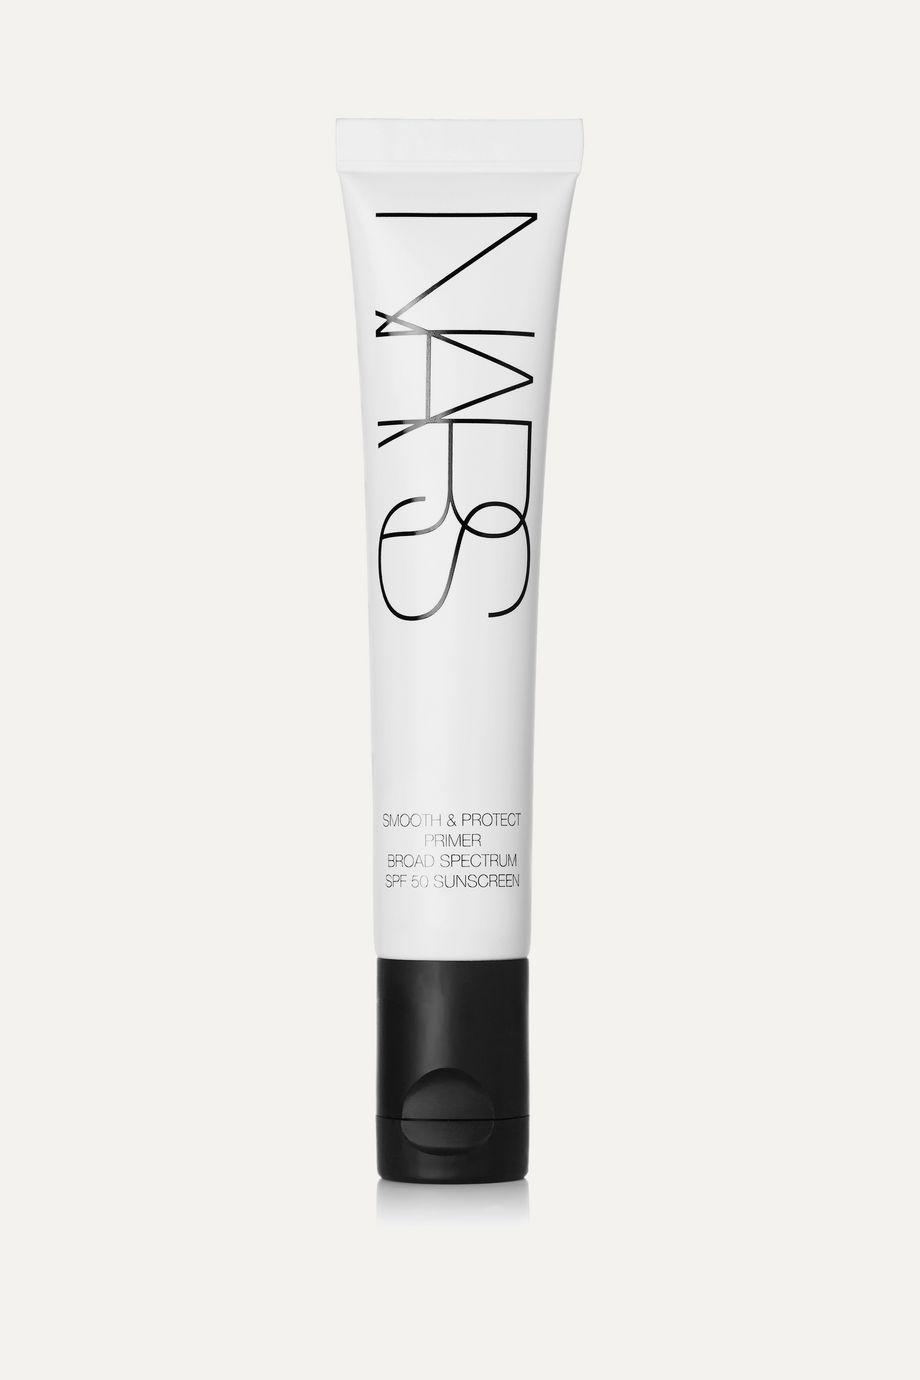 NARS Smooth & Protect Primer LSF 50, 30 ml – Primer